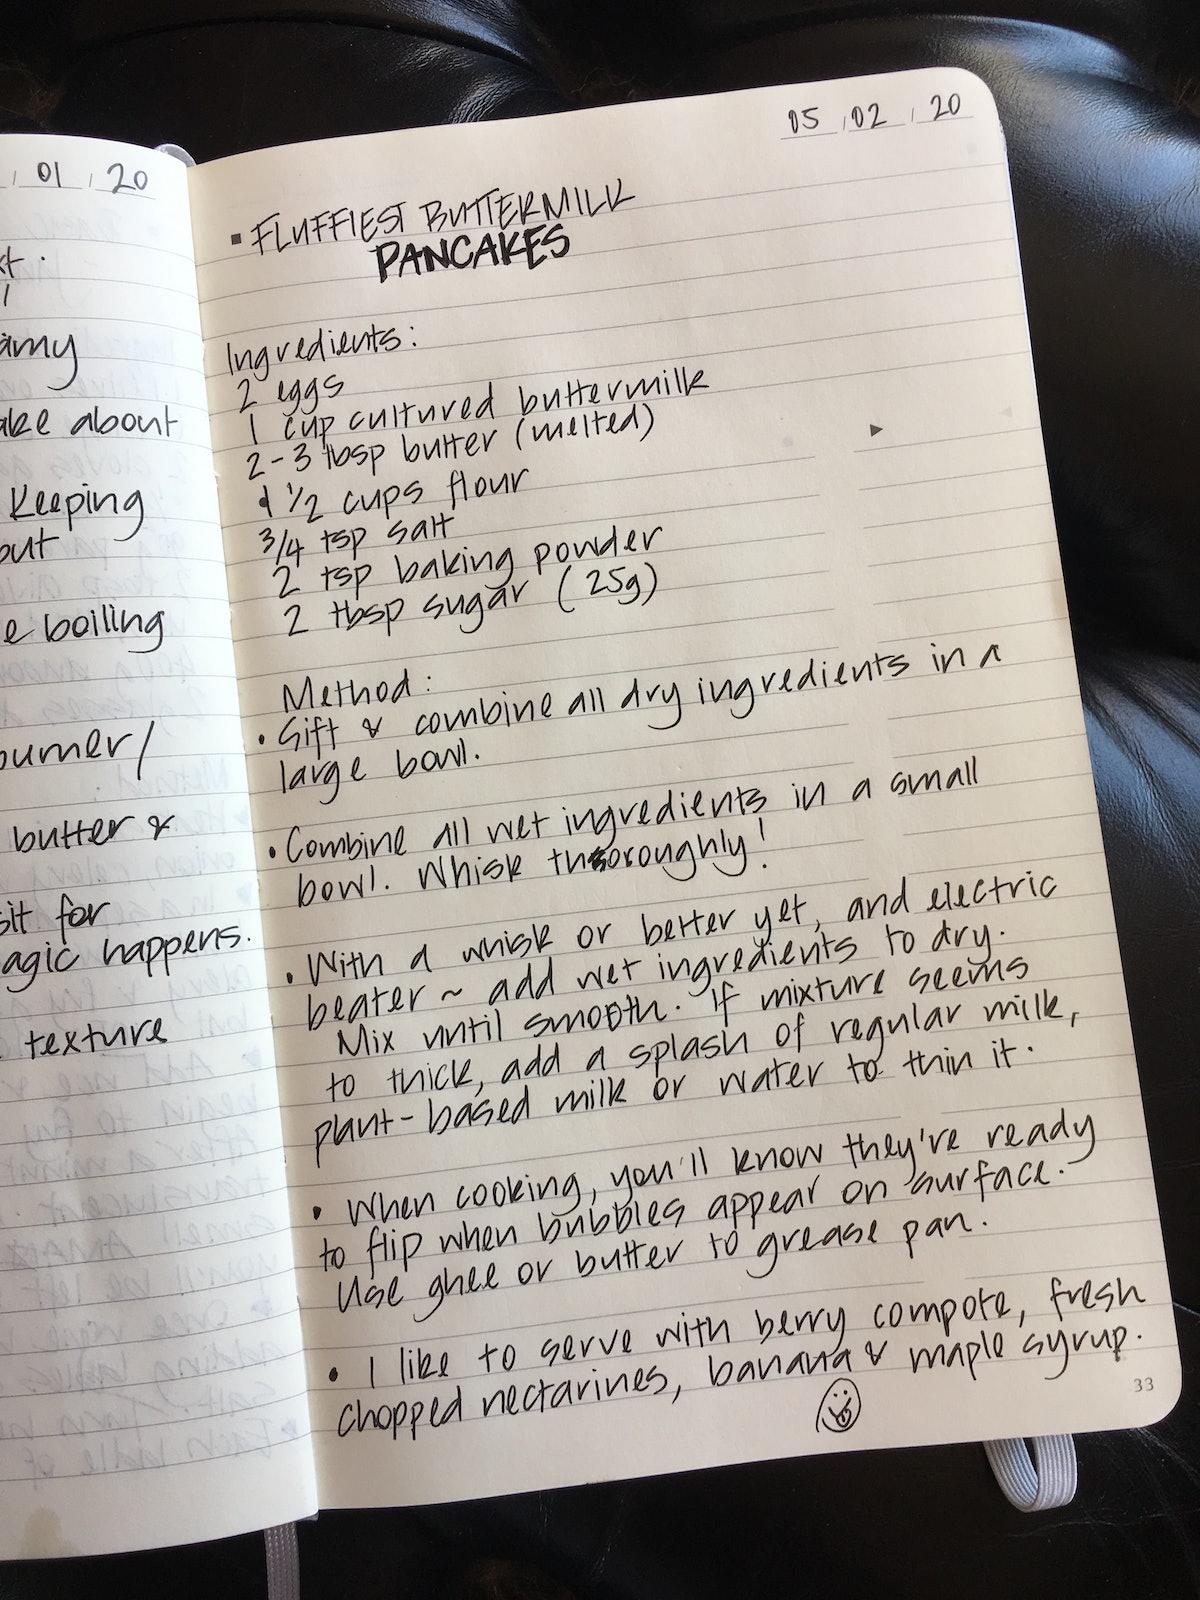 Collie's Buttermilk Pancake Recipe